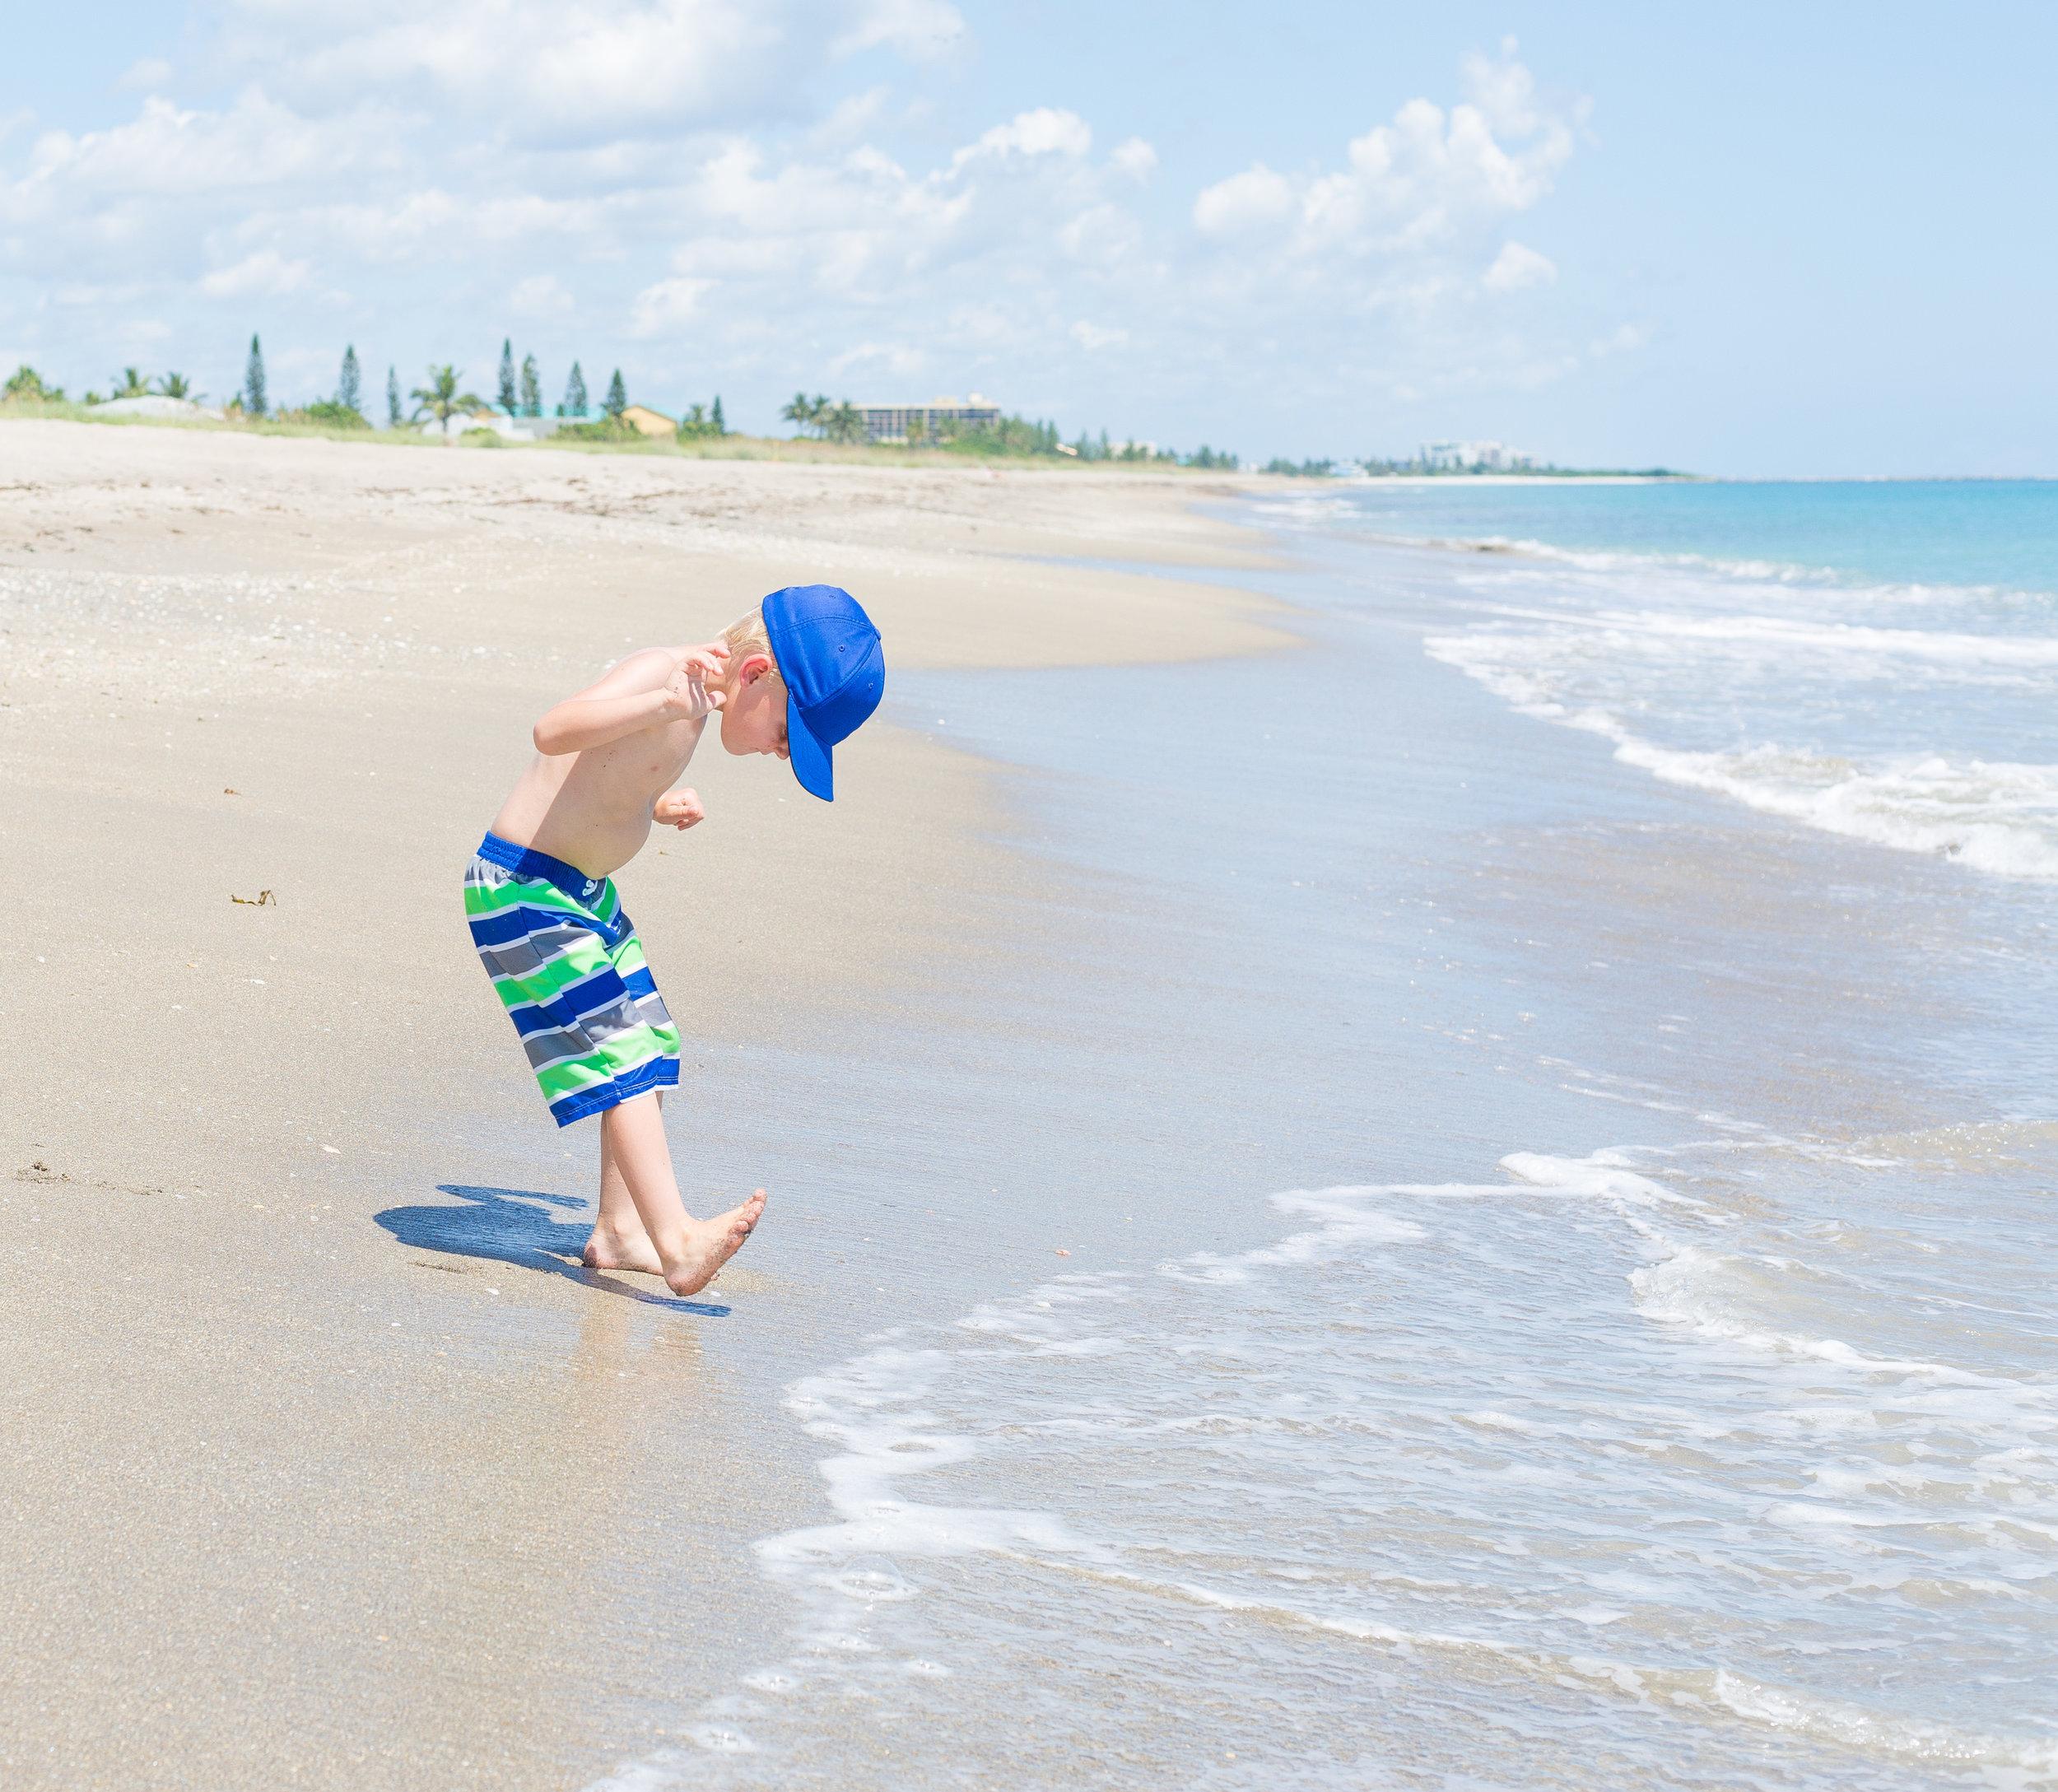 Florida Beach Personal Project-11.jpg